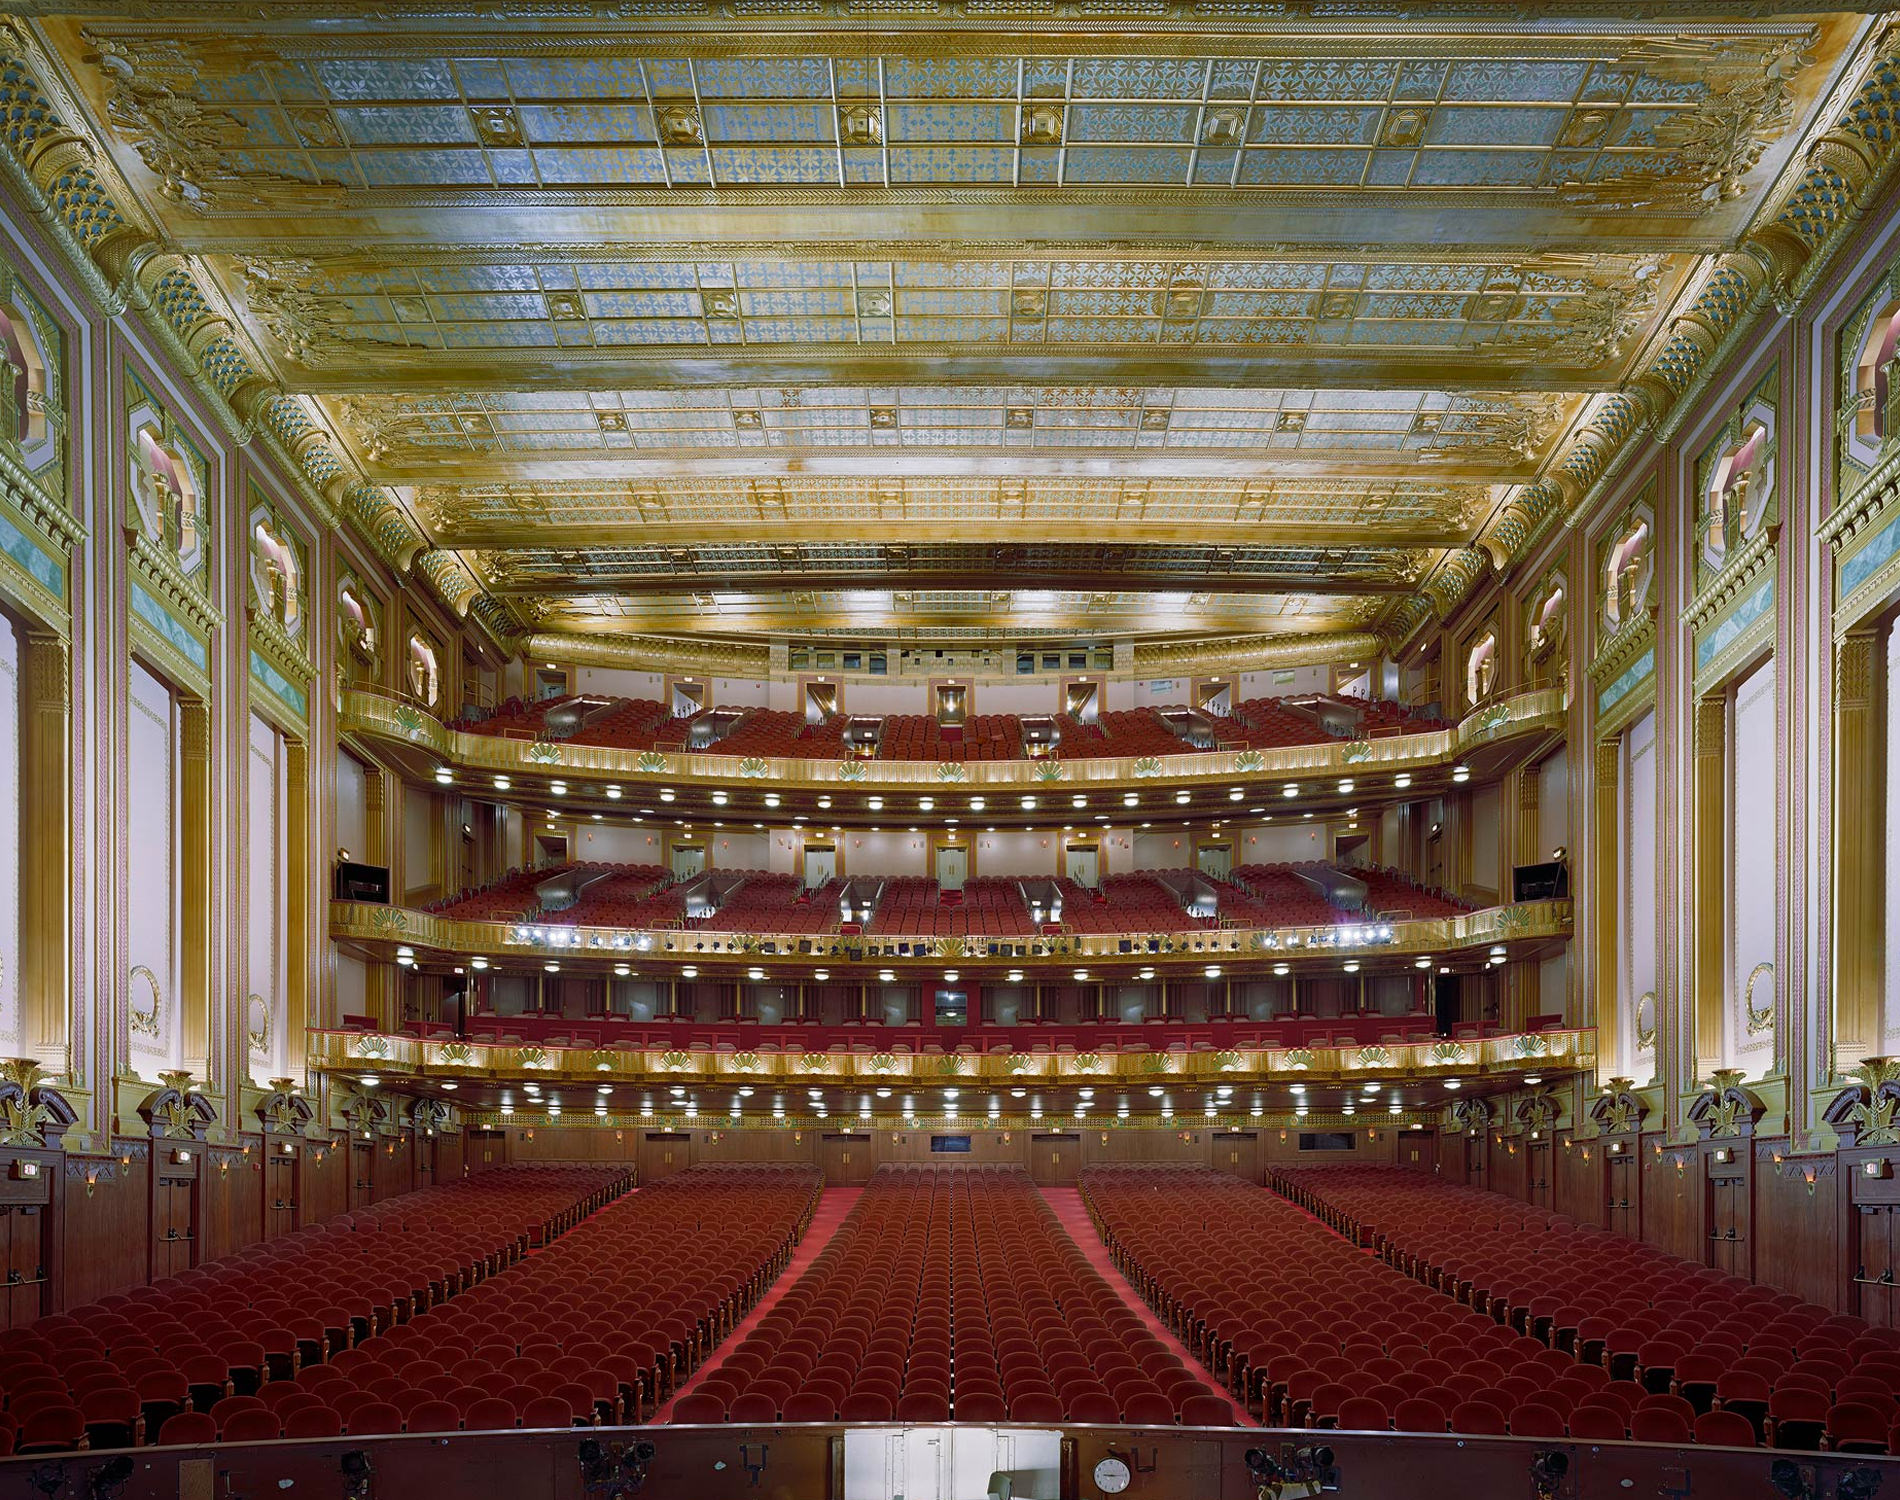 David Leventi Serie Photographie Opera Civic Opera House Chicago Etats-Unis 2009